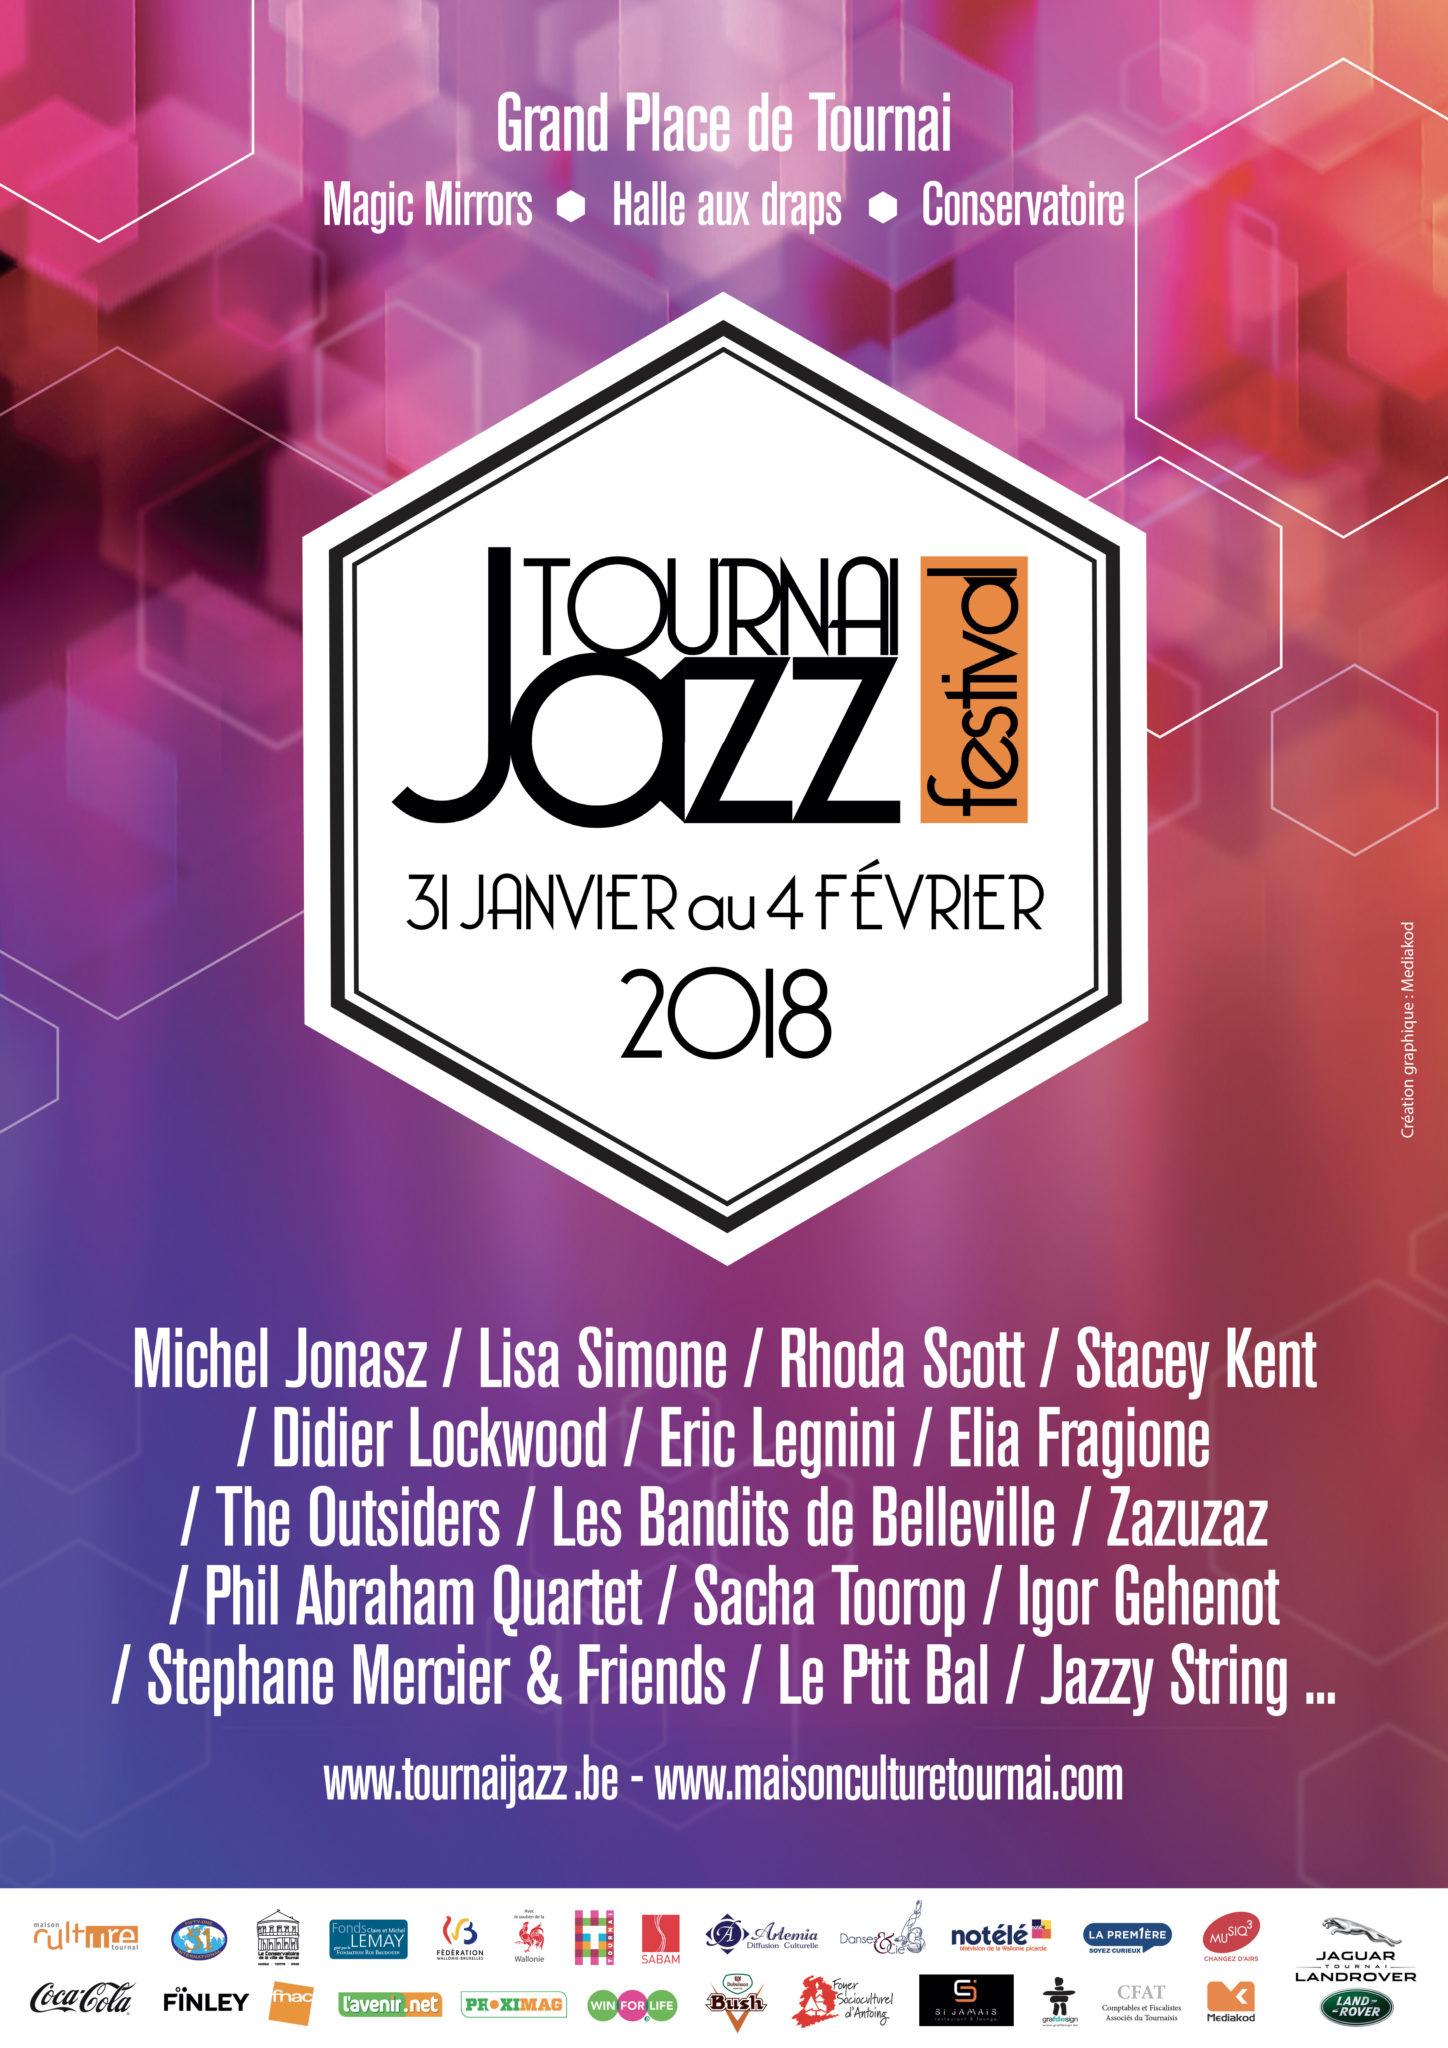 AFFICHE-A3 Tournai Jazz-generale - 2018 - ok.indd